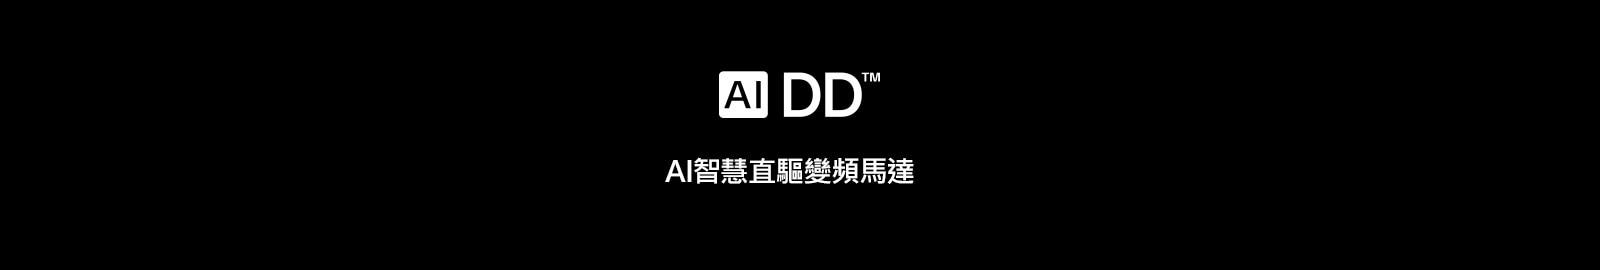 WM-TopGun2-01-2-AIDD-D